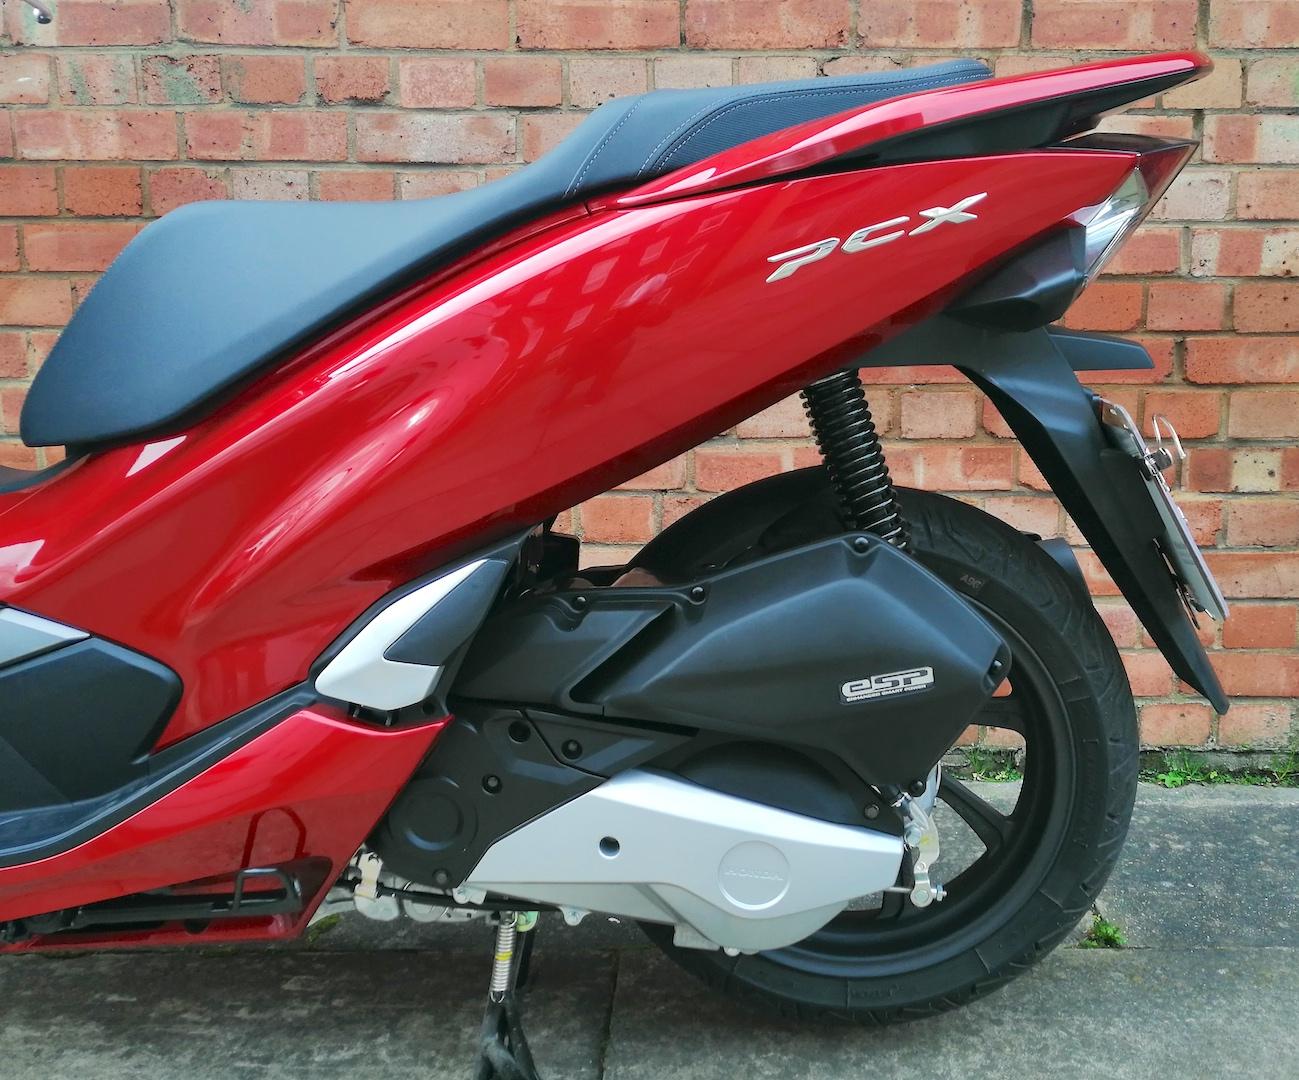 2020 Honda PCX 125, Showroom condition with 13 miles